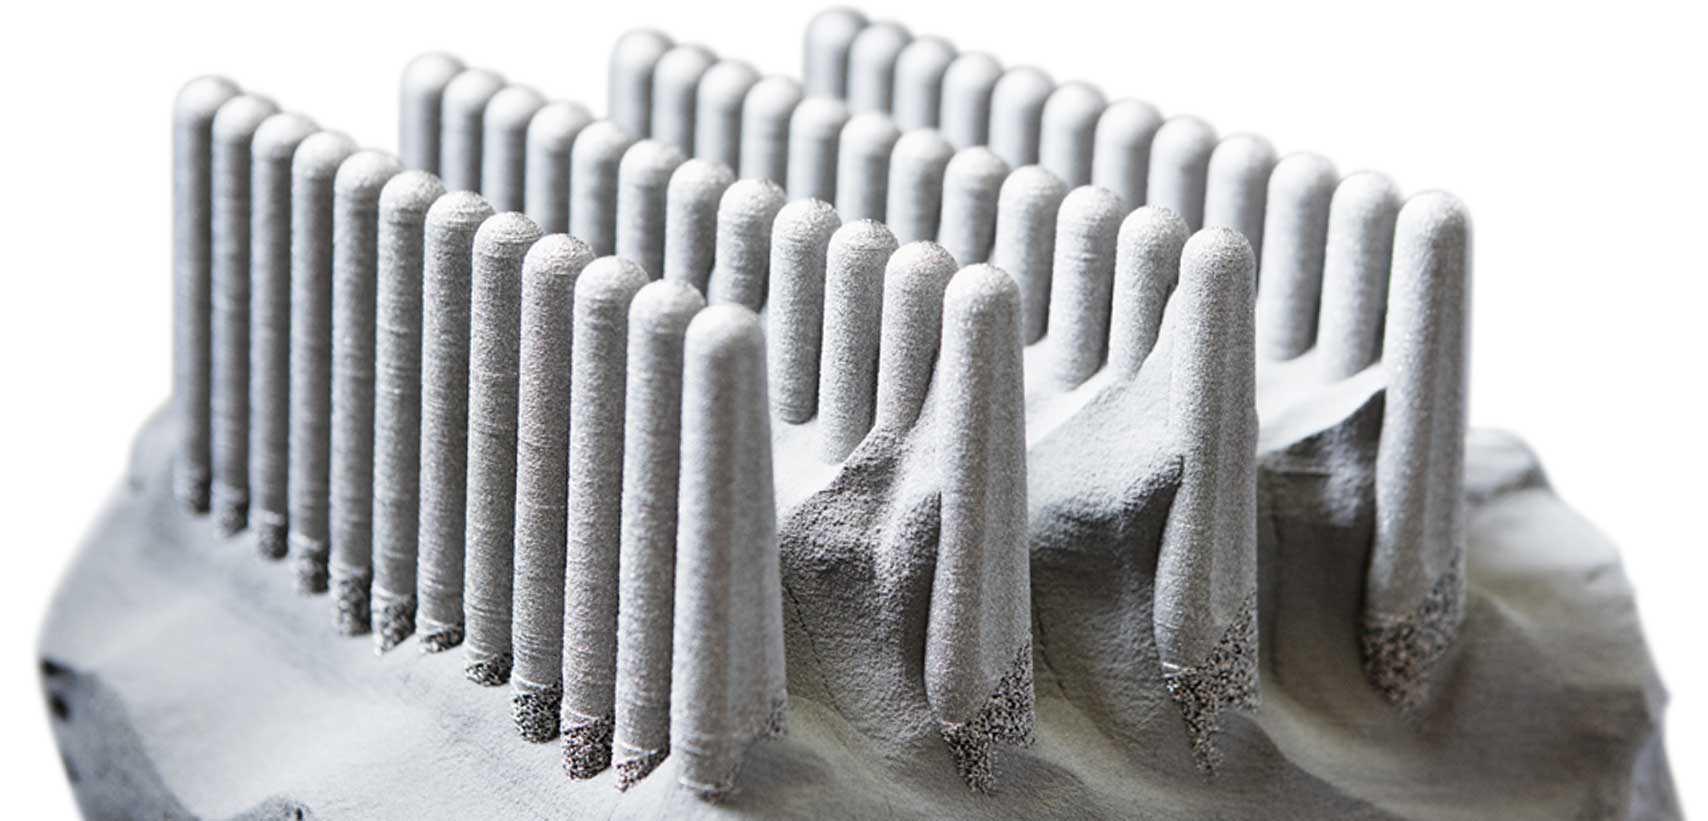 ge-3d-printing-arcam-concept-laser-3